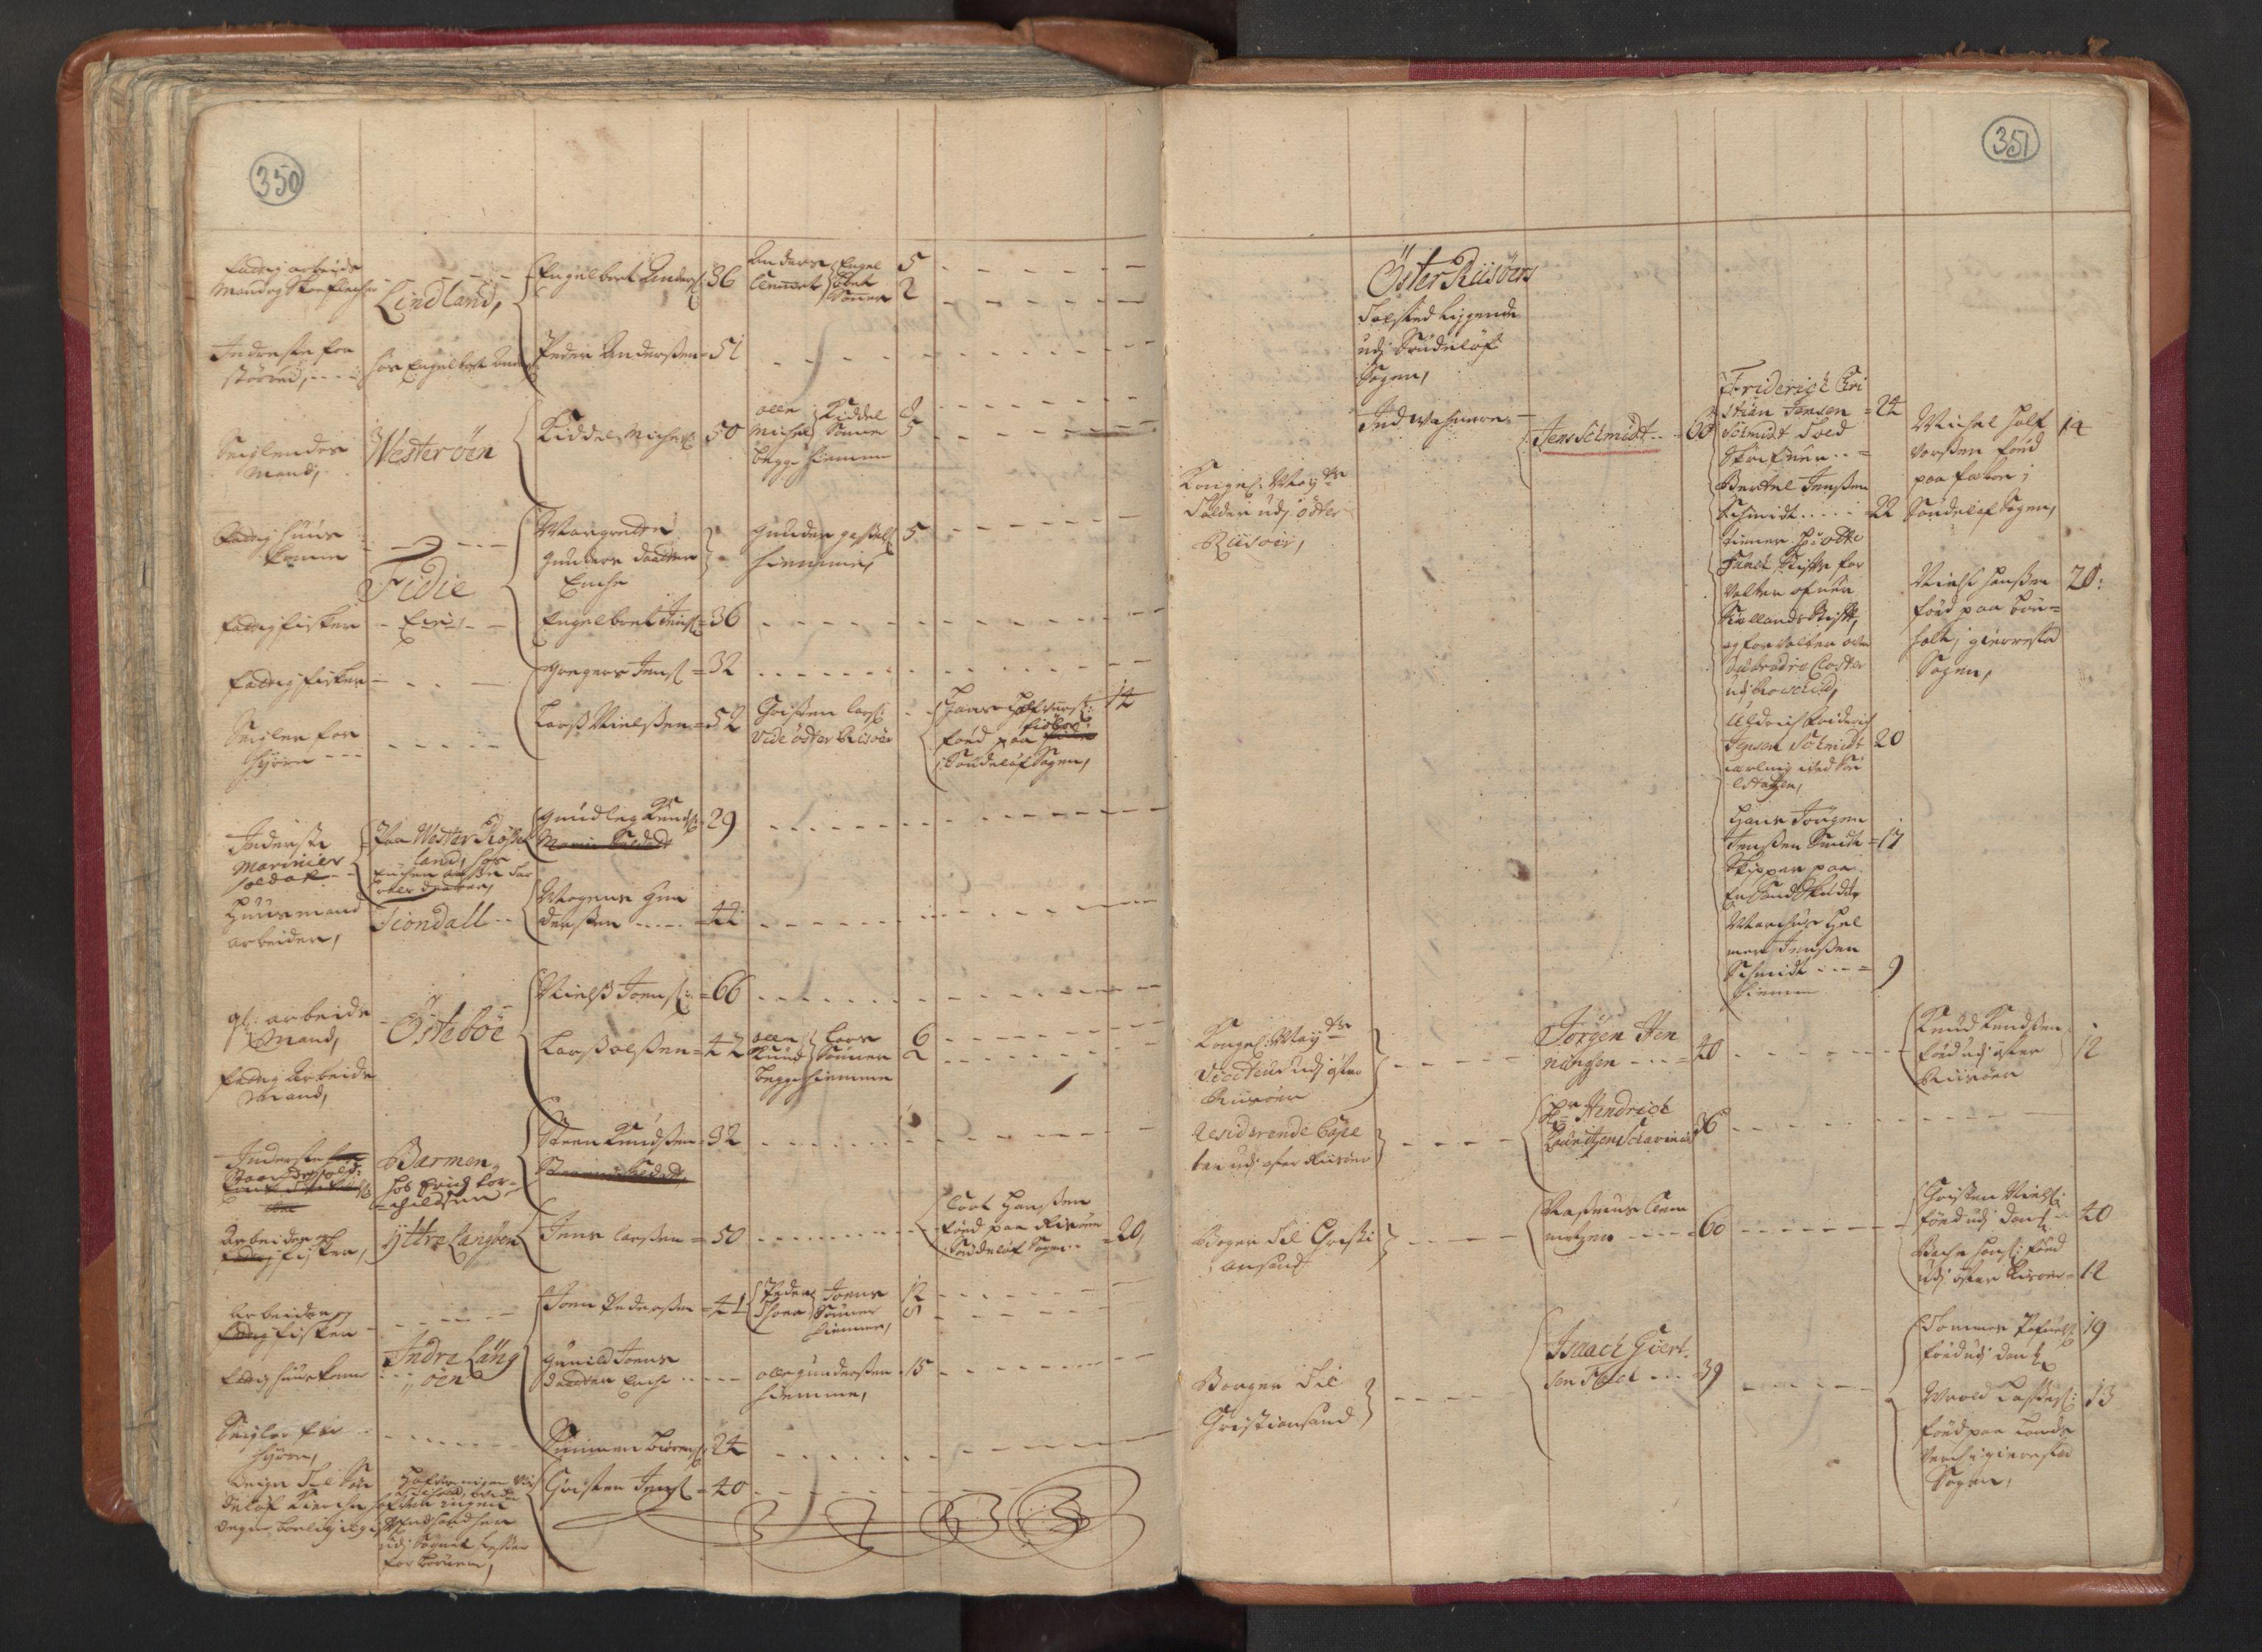 RA, Manntallet 1701, nr. 3: Nedenes fogderi, 1701, s. 350-351